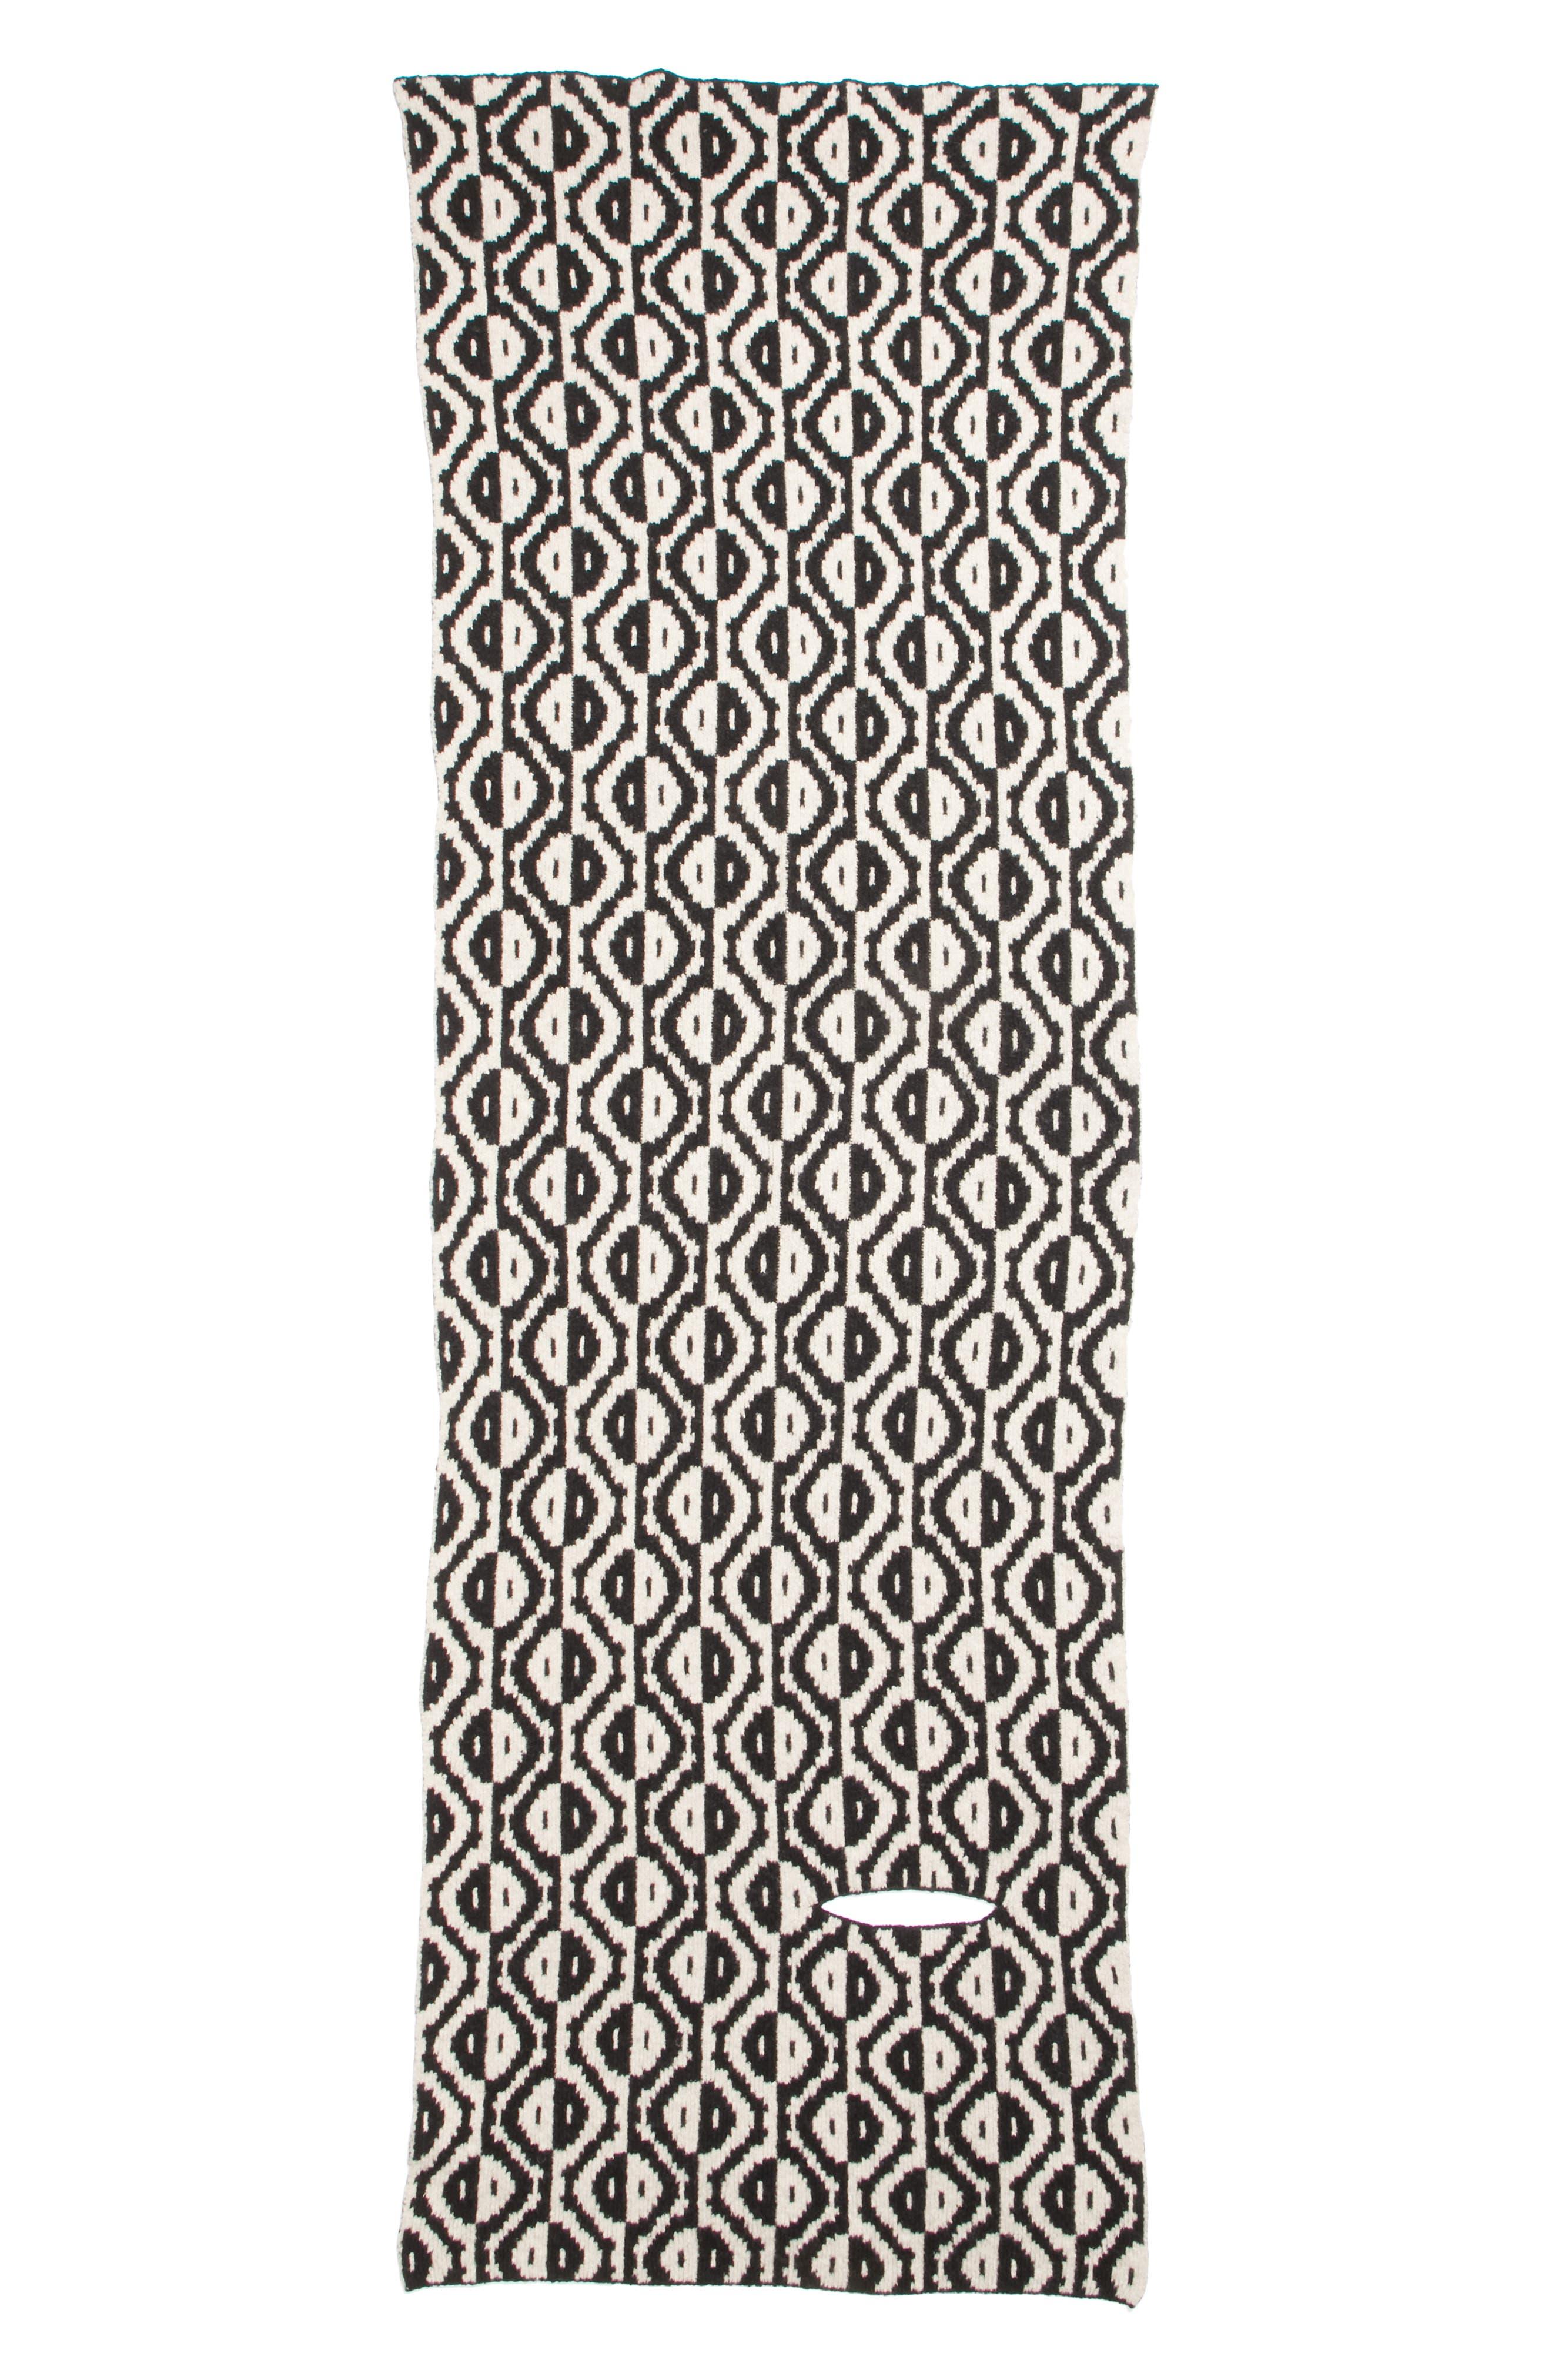 Geo Jacquard Merino Wool Blend Scarf,                         Main,                         color, BLACK